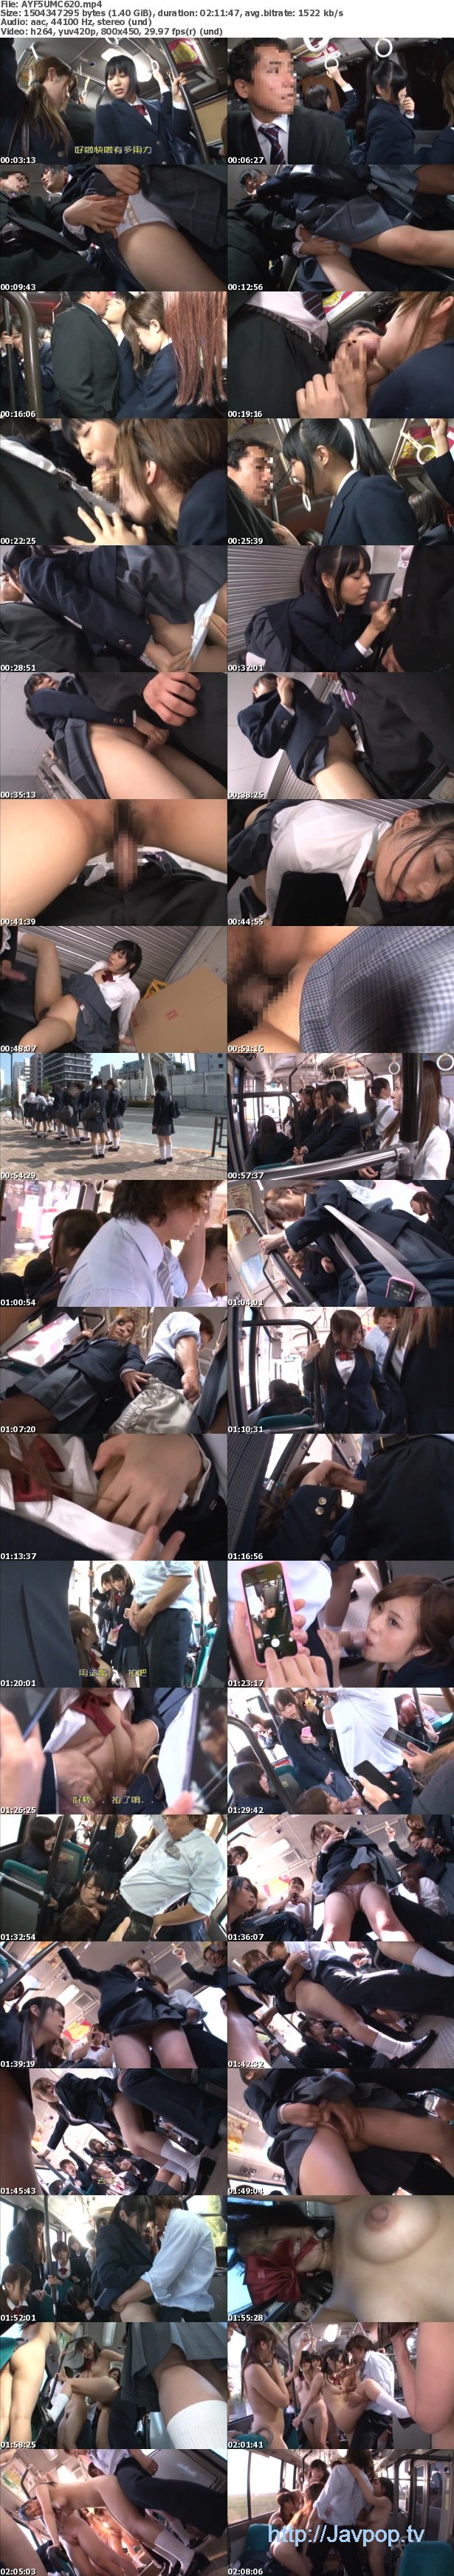 [NHDTA-620] 在上下學時不經意碰到男人肉棒後受不了不管周遭眼光在通學巴士上扭腰做愛的女子校生[中文字幕]